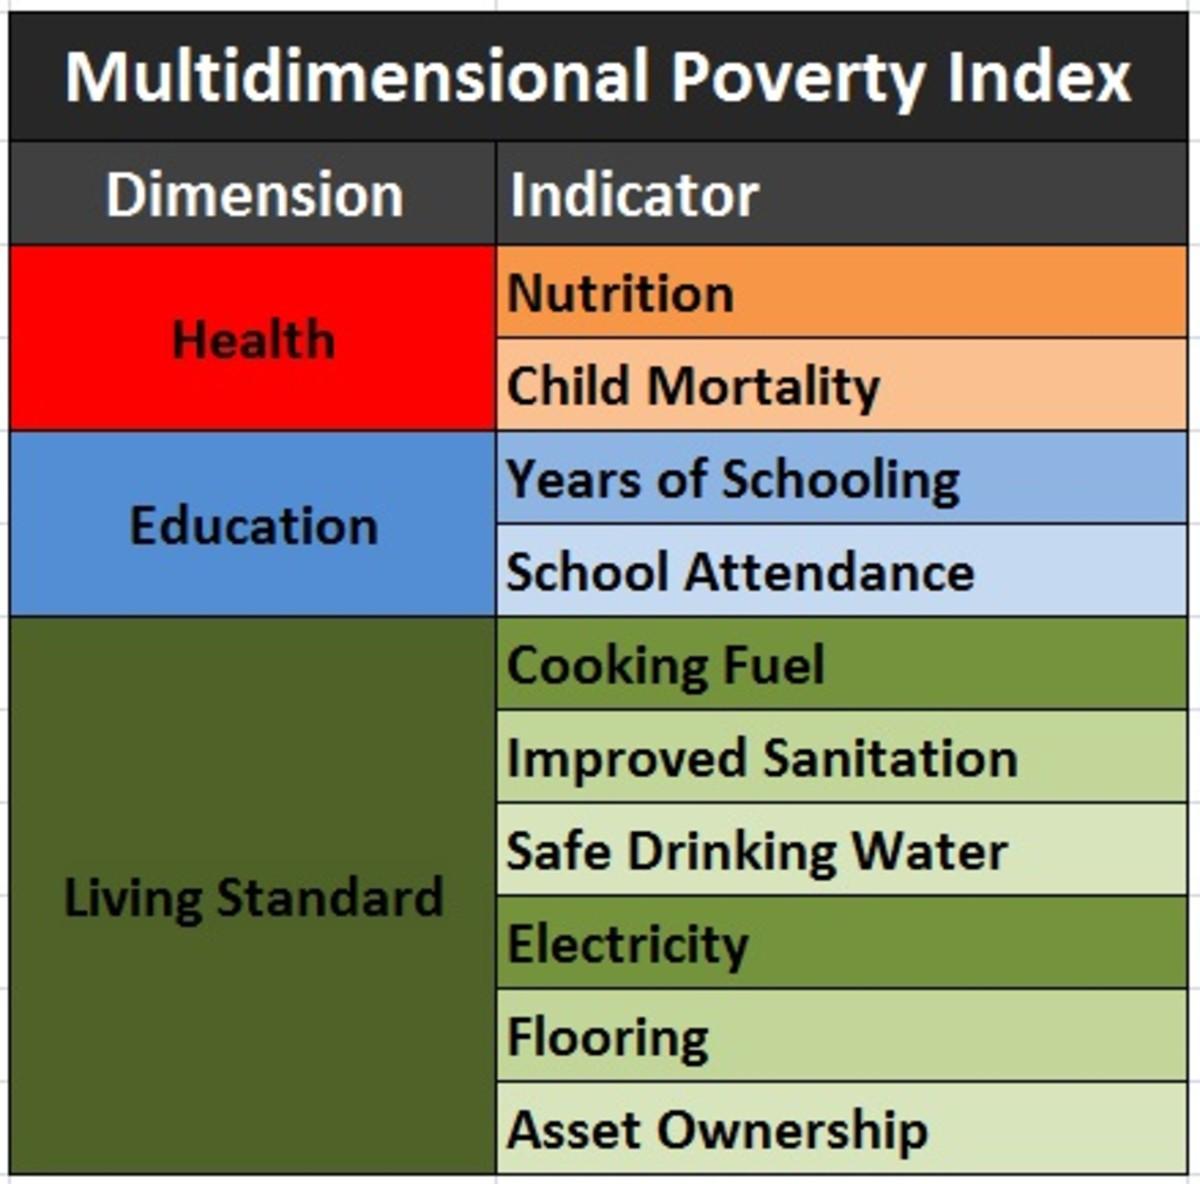 The MPI has 10 indicators of three dimensions.